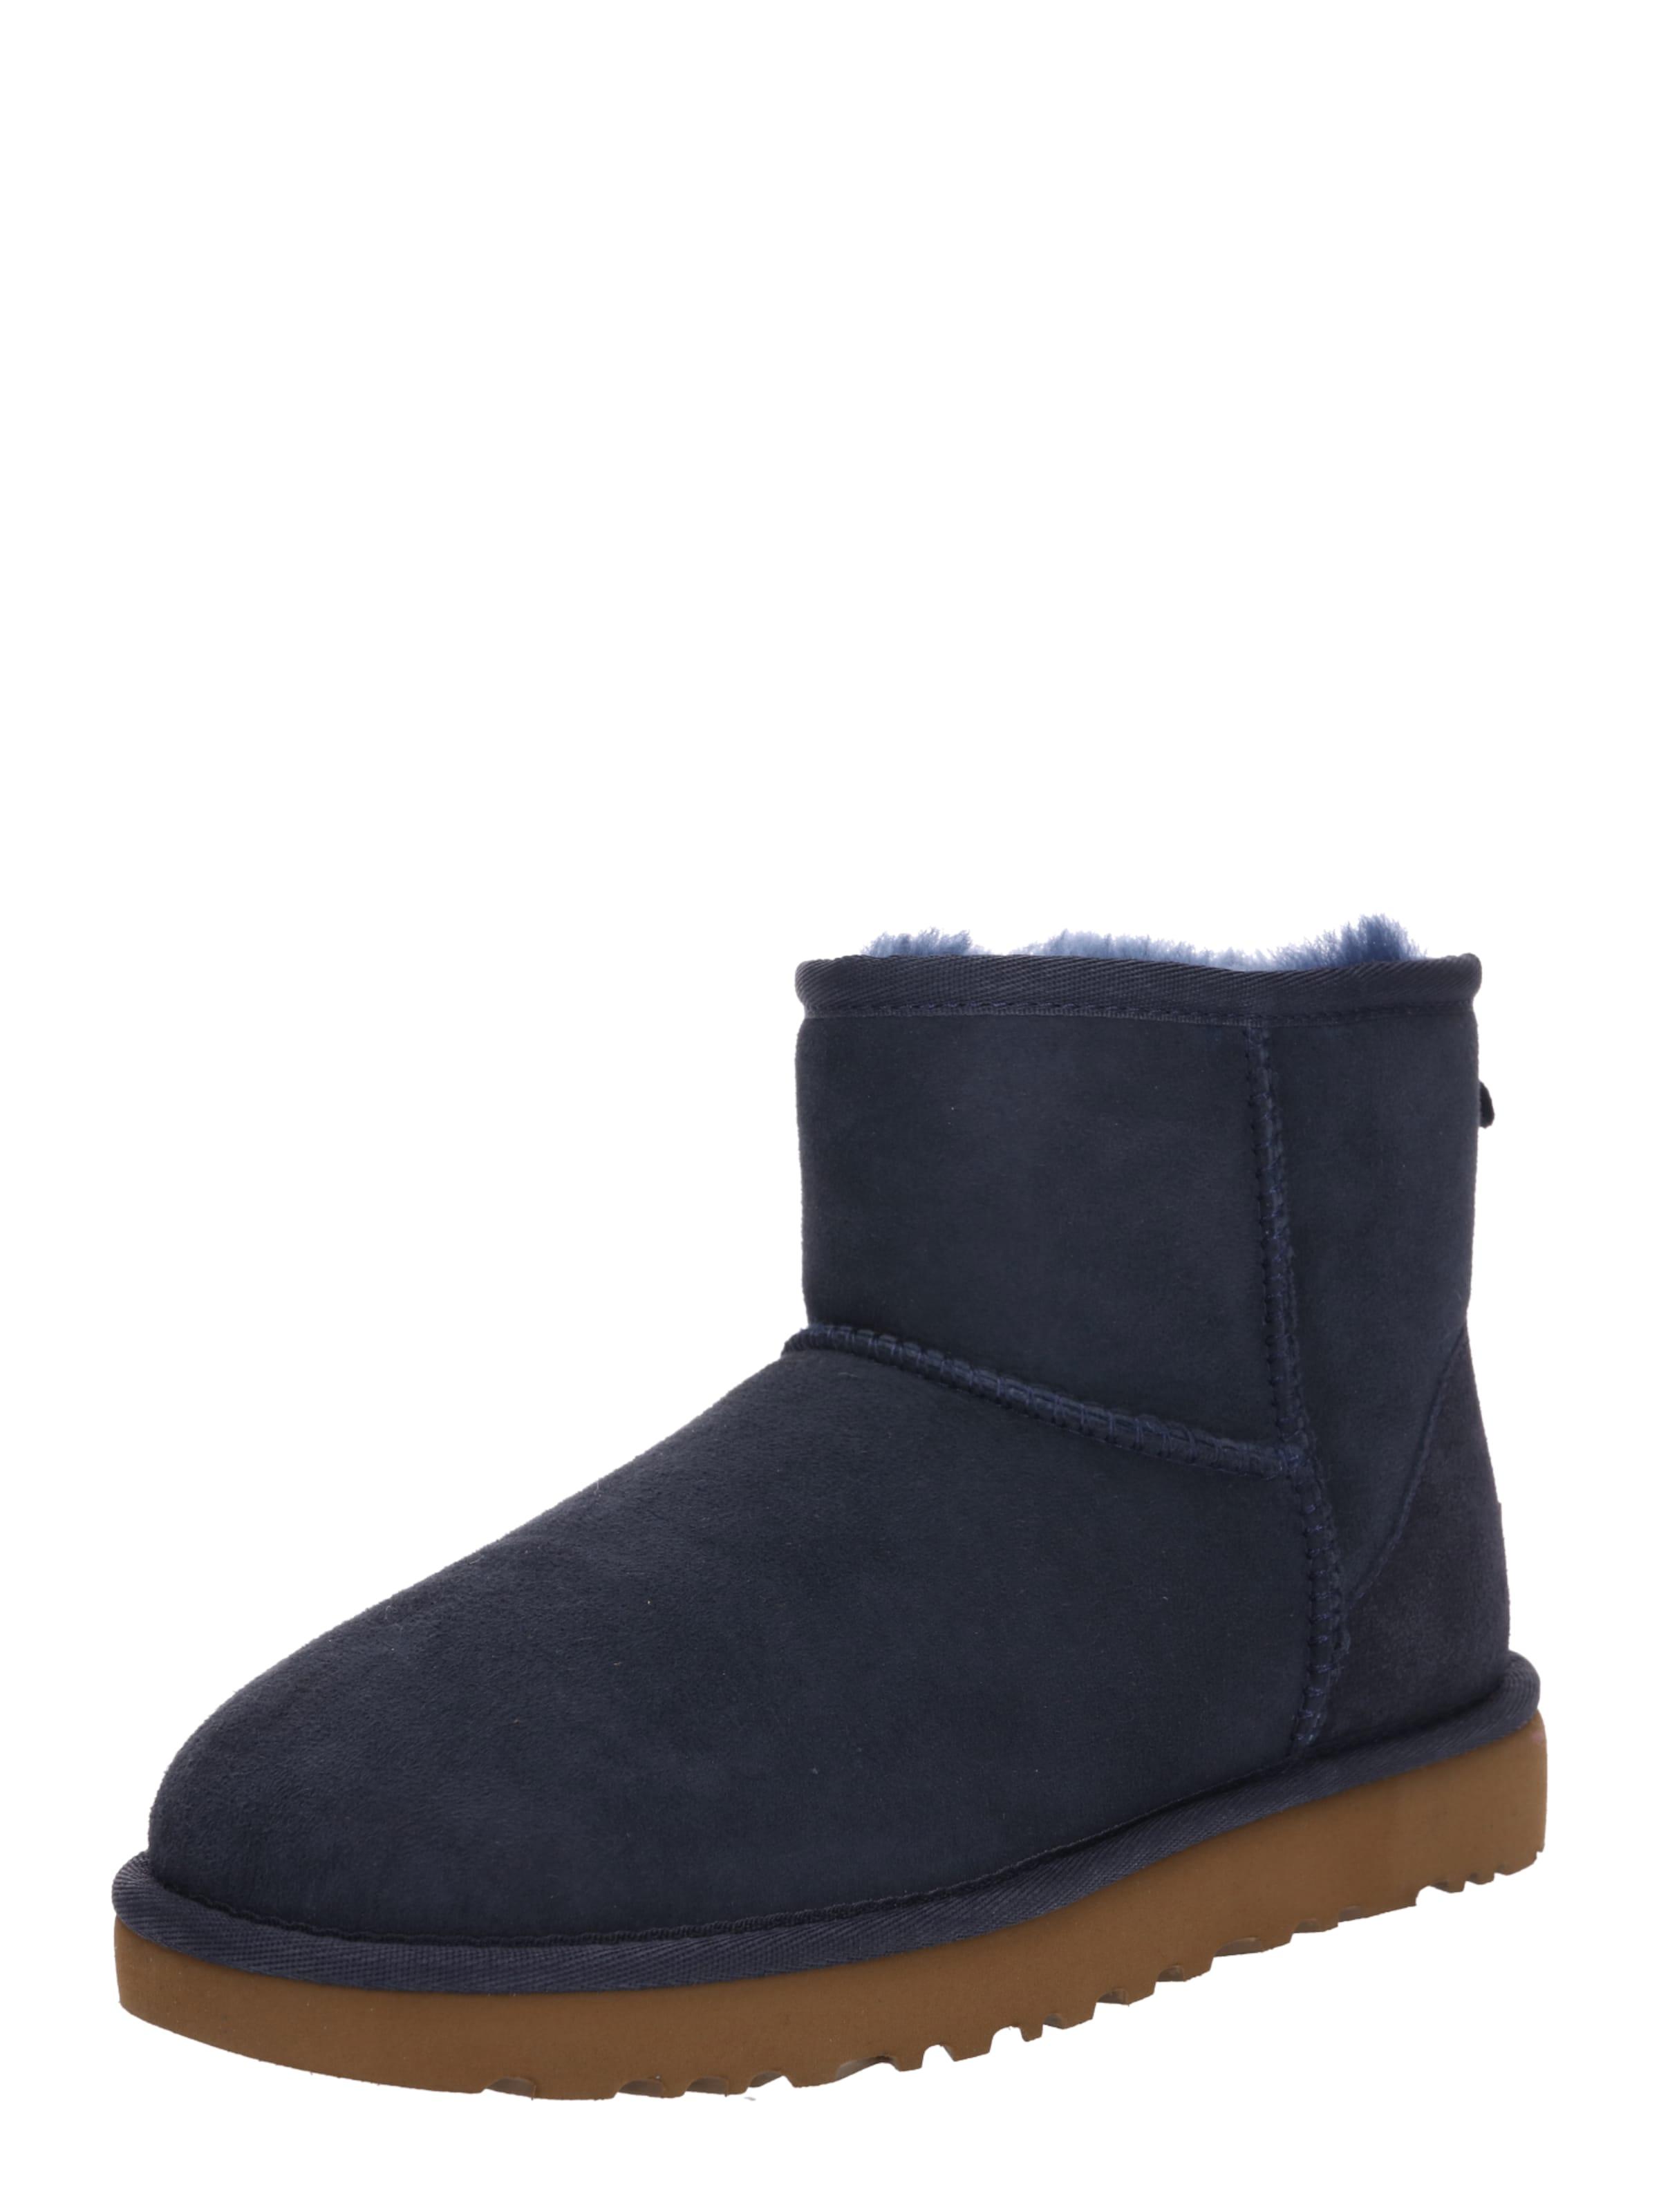 Ii' Marine Boots Mini En Ugg Bleu 'classic Yv6Ibfgmy7